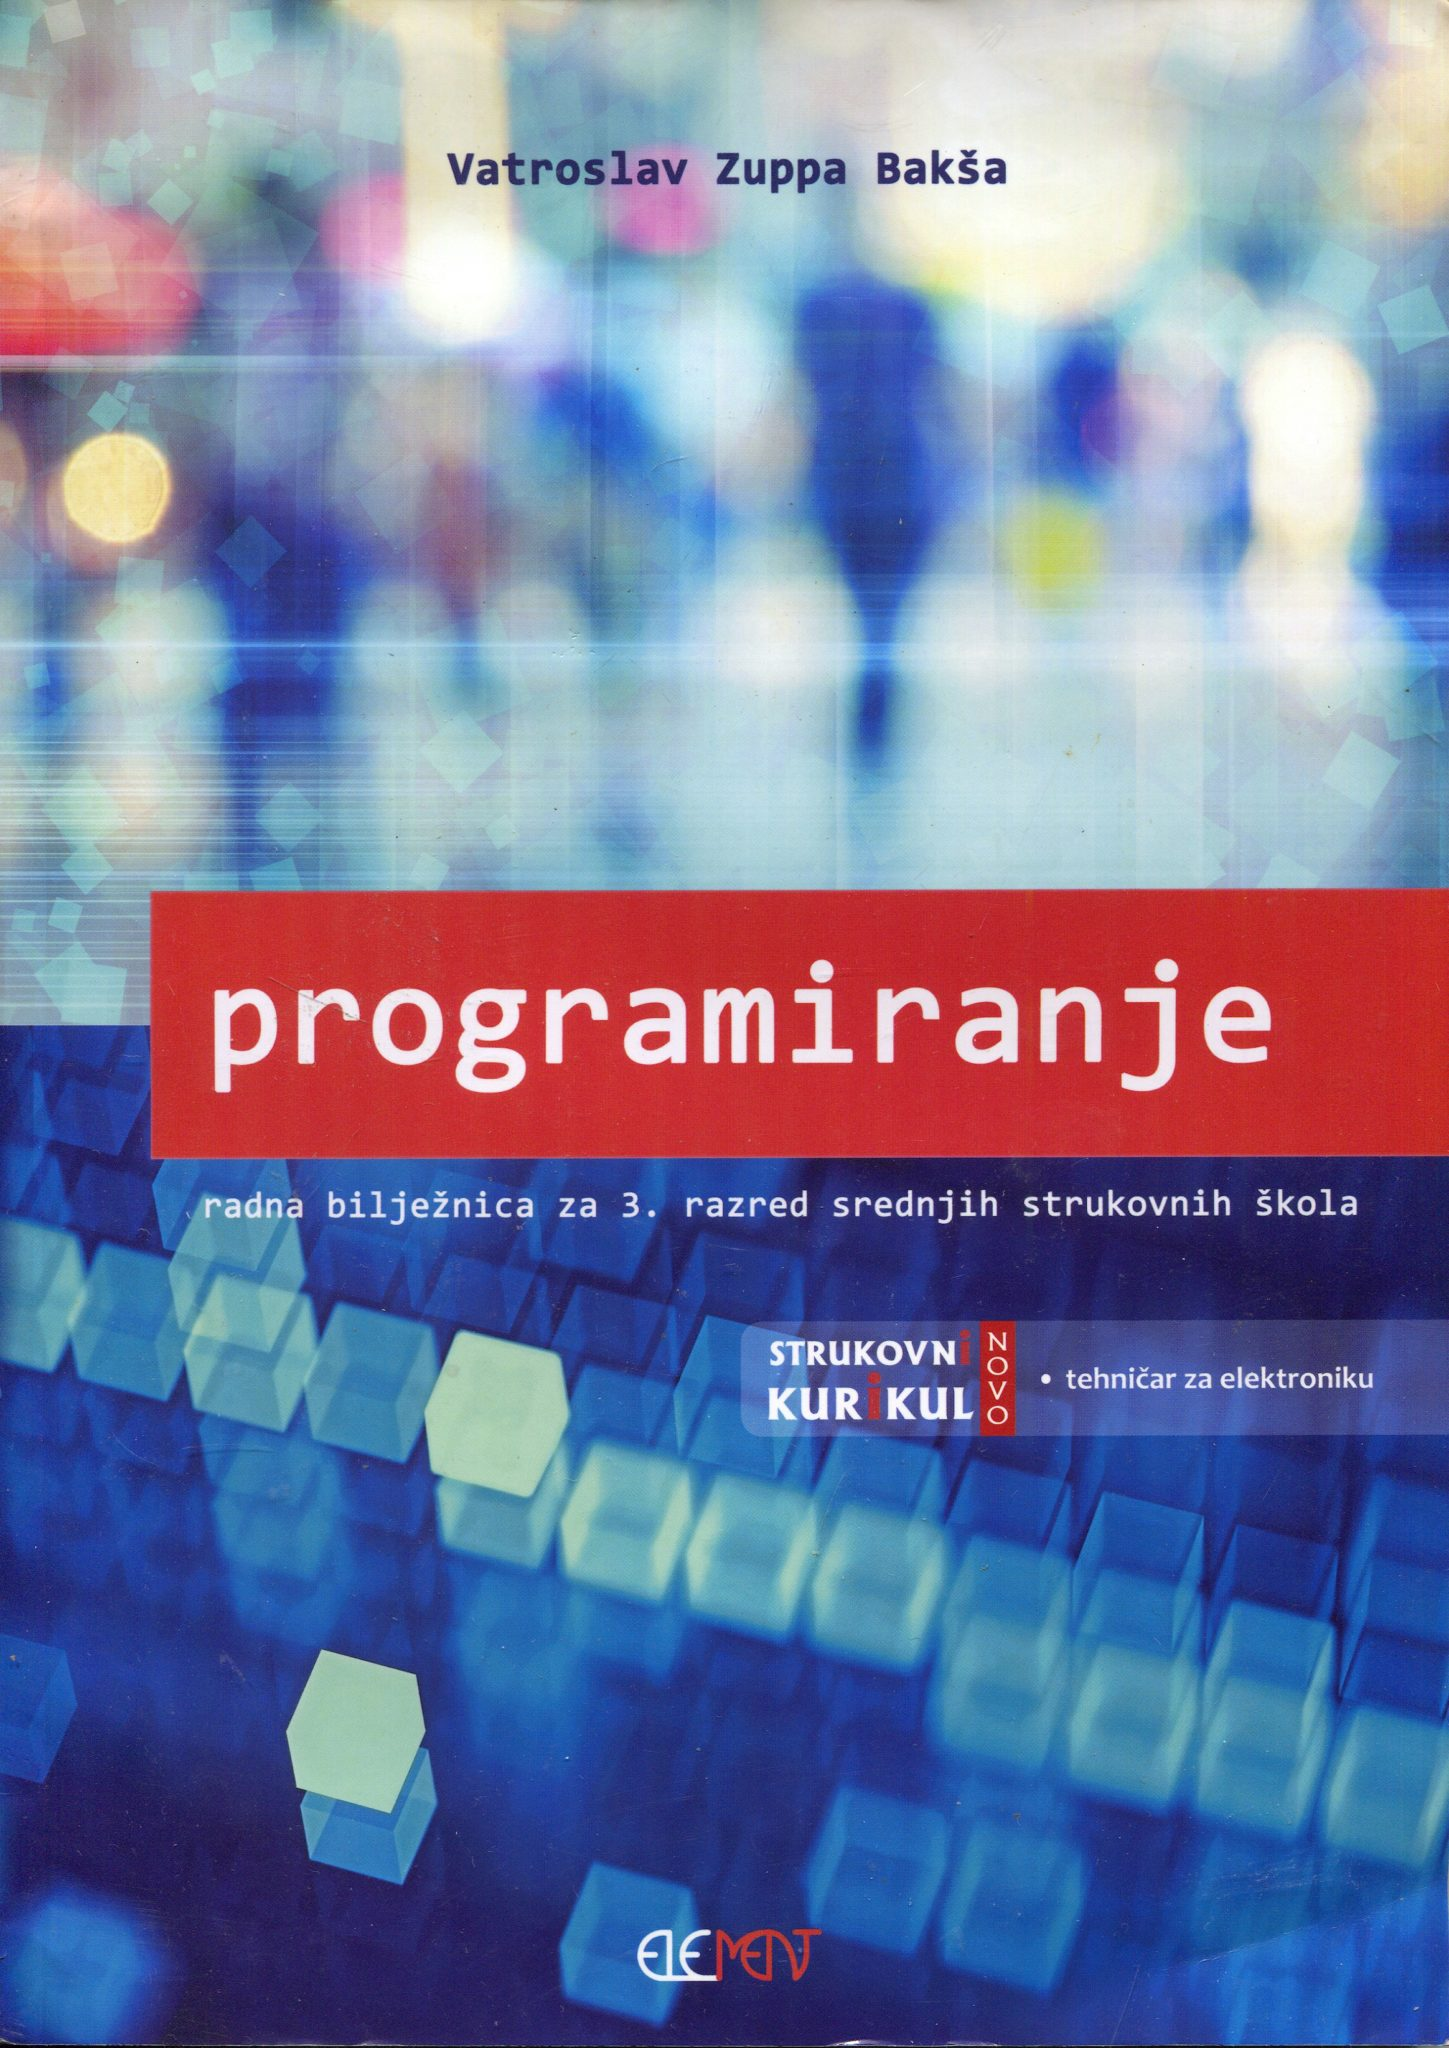 Programiranje, radna bilježnica za 3. razred srednjih strukovnih škola autora Vatroslav Zuppa Bakša